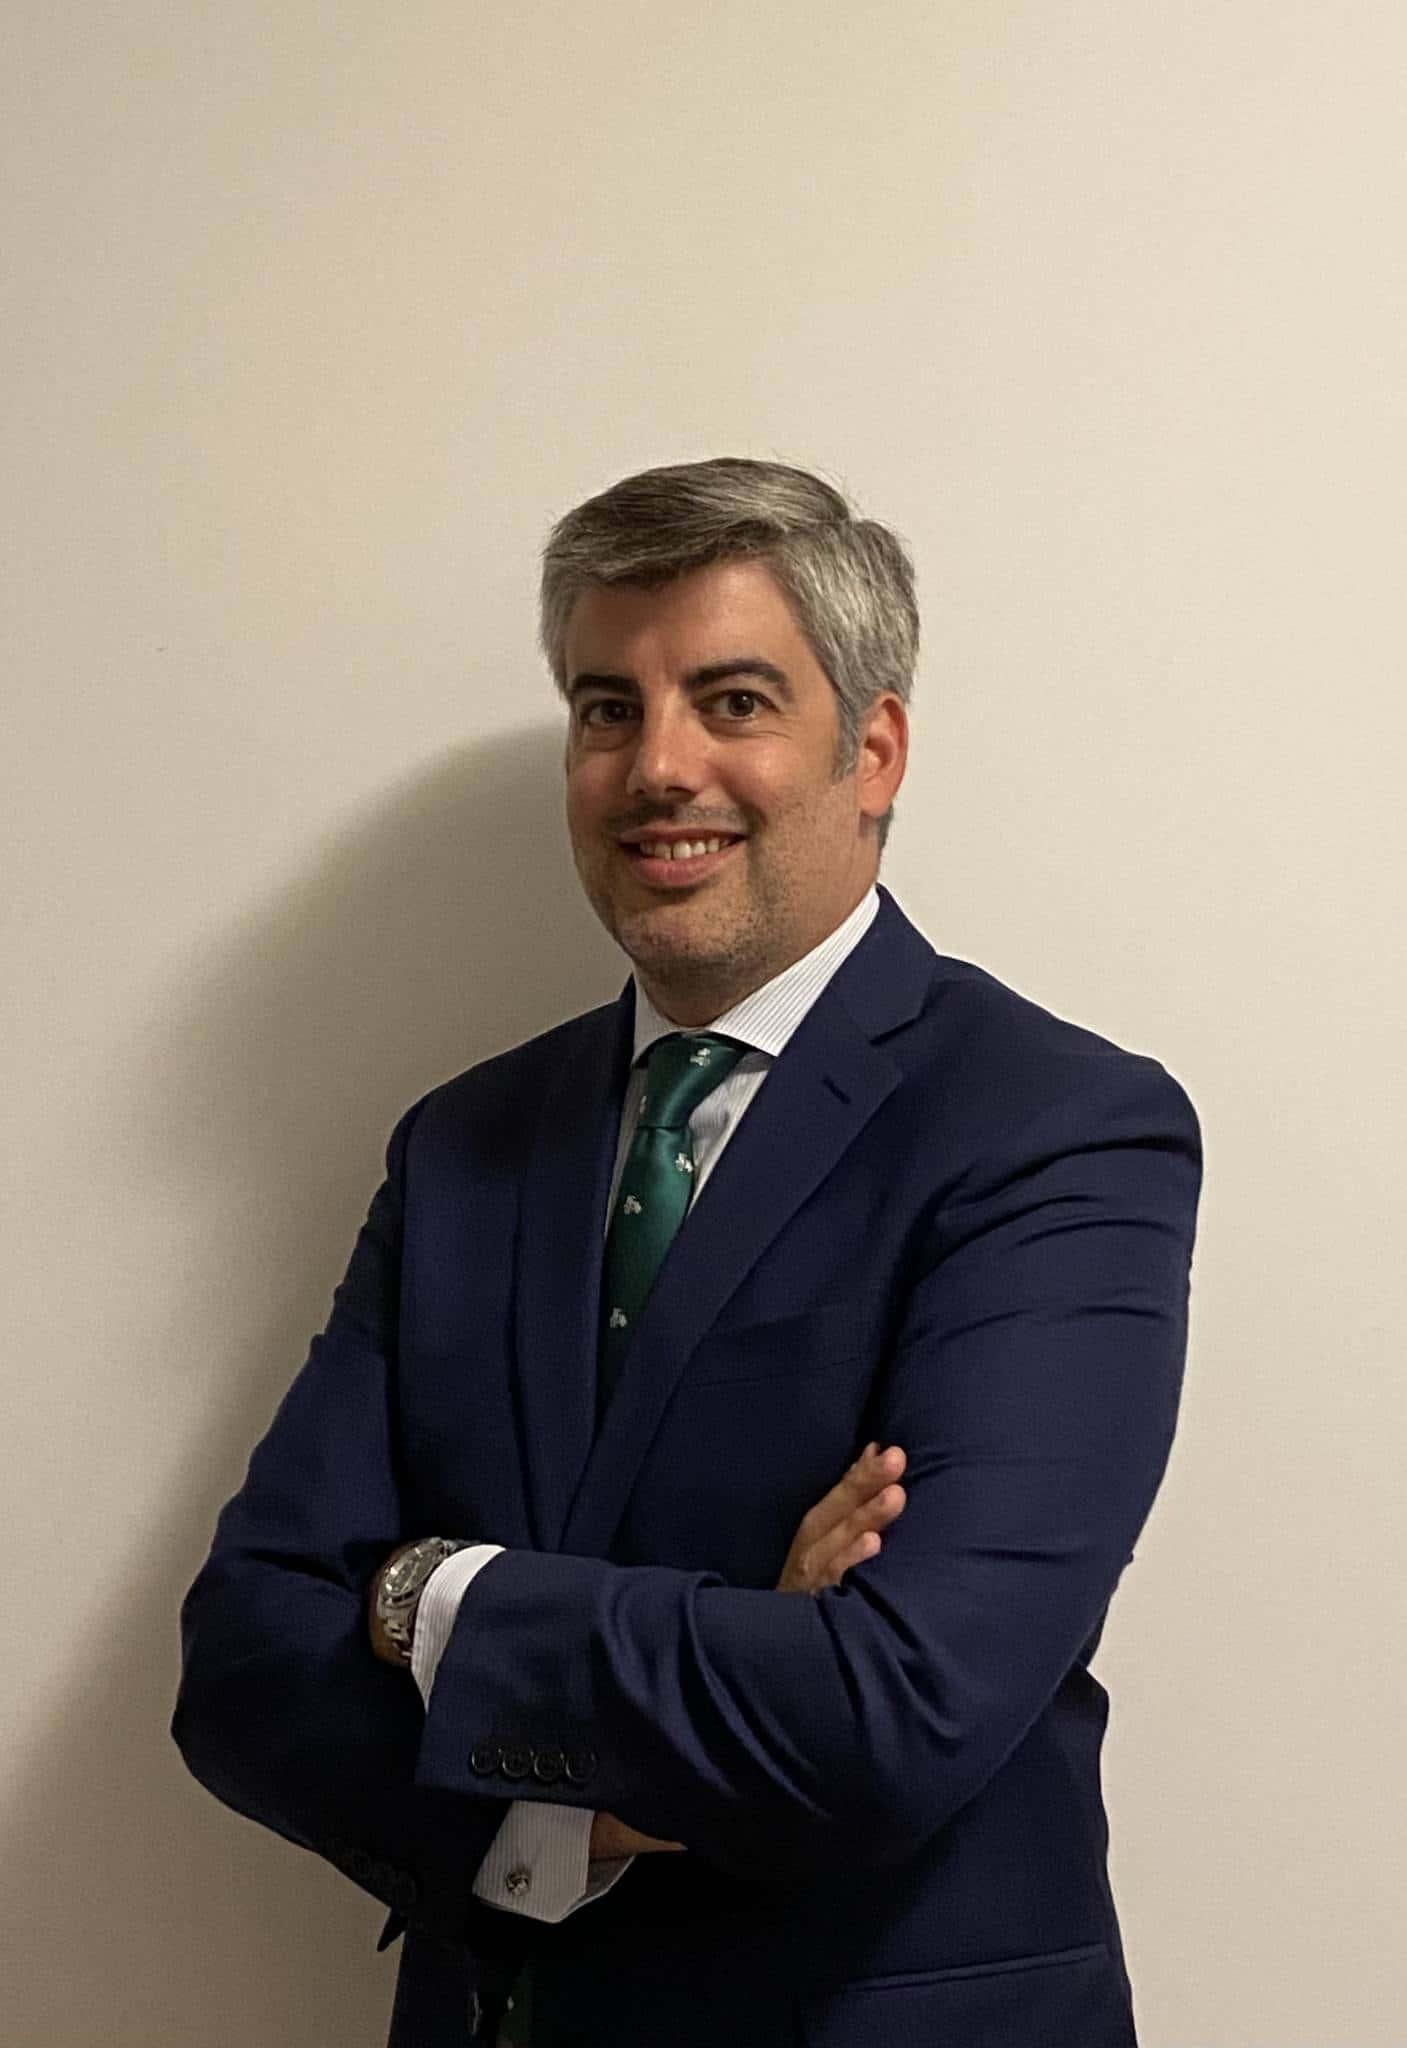 Juan Antonio Tenor, IT Manager en Admiral Group